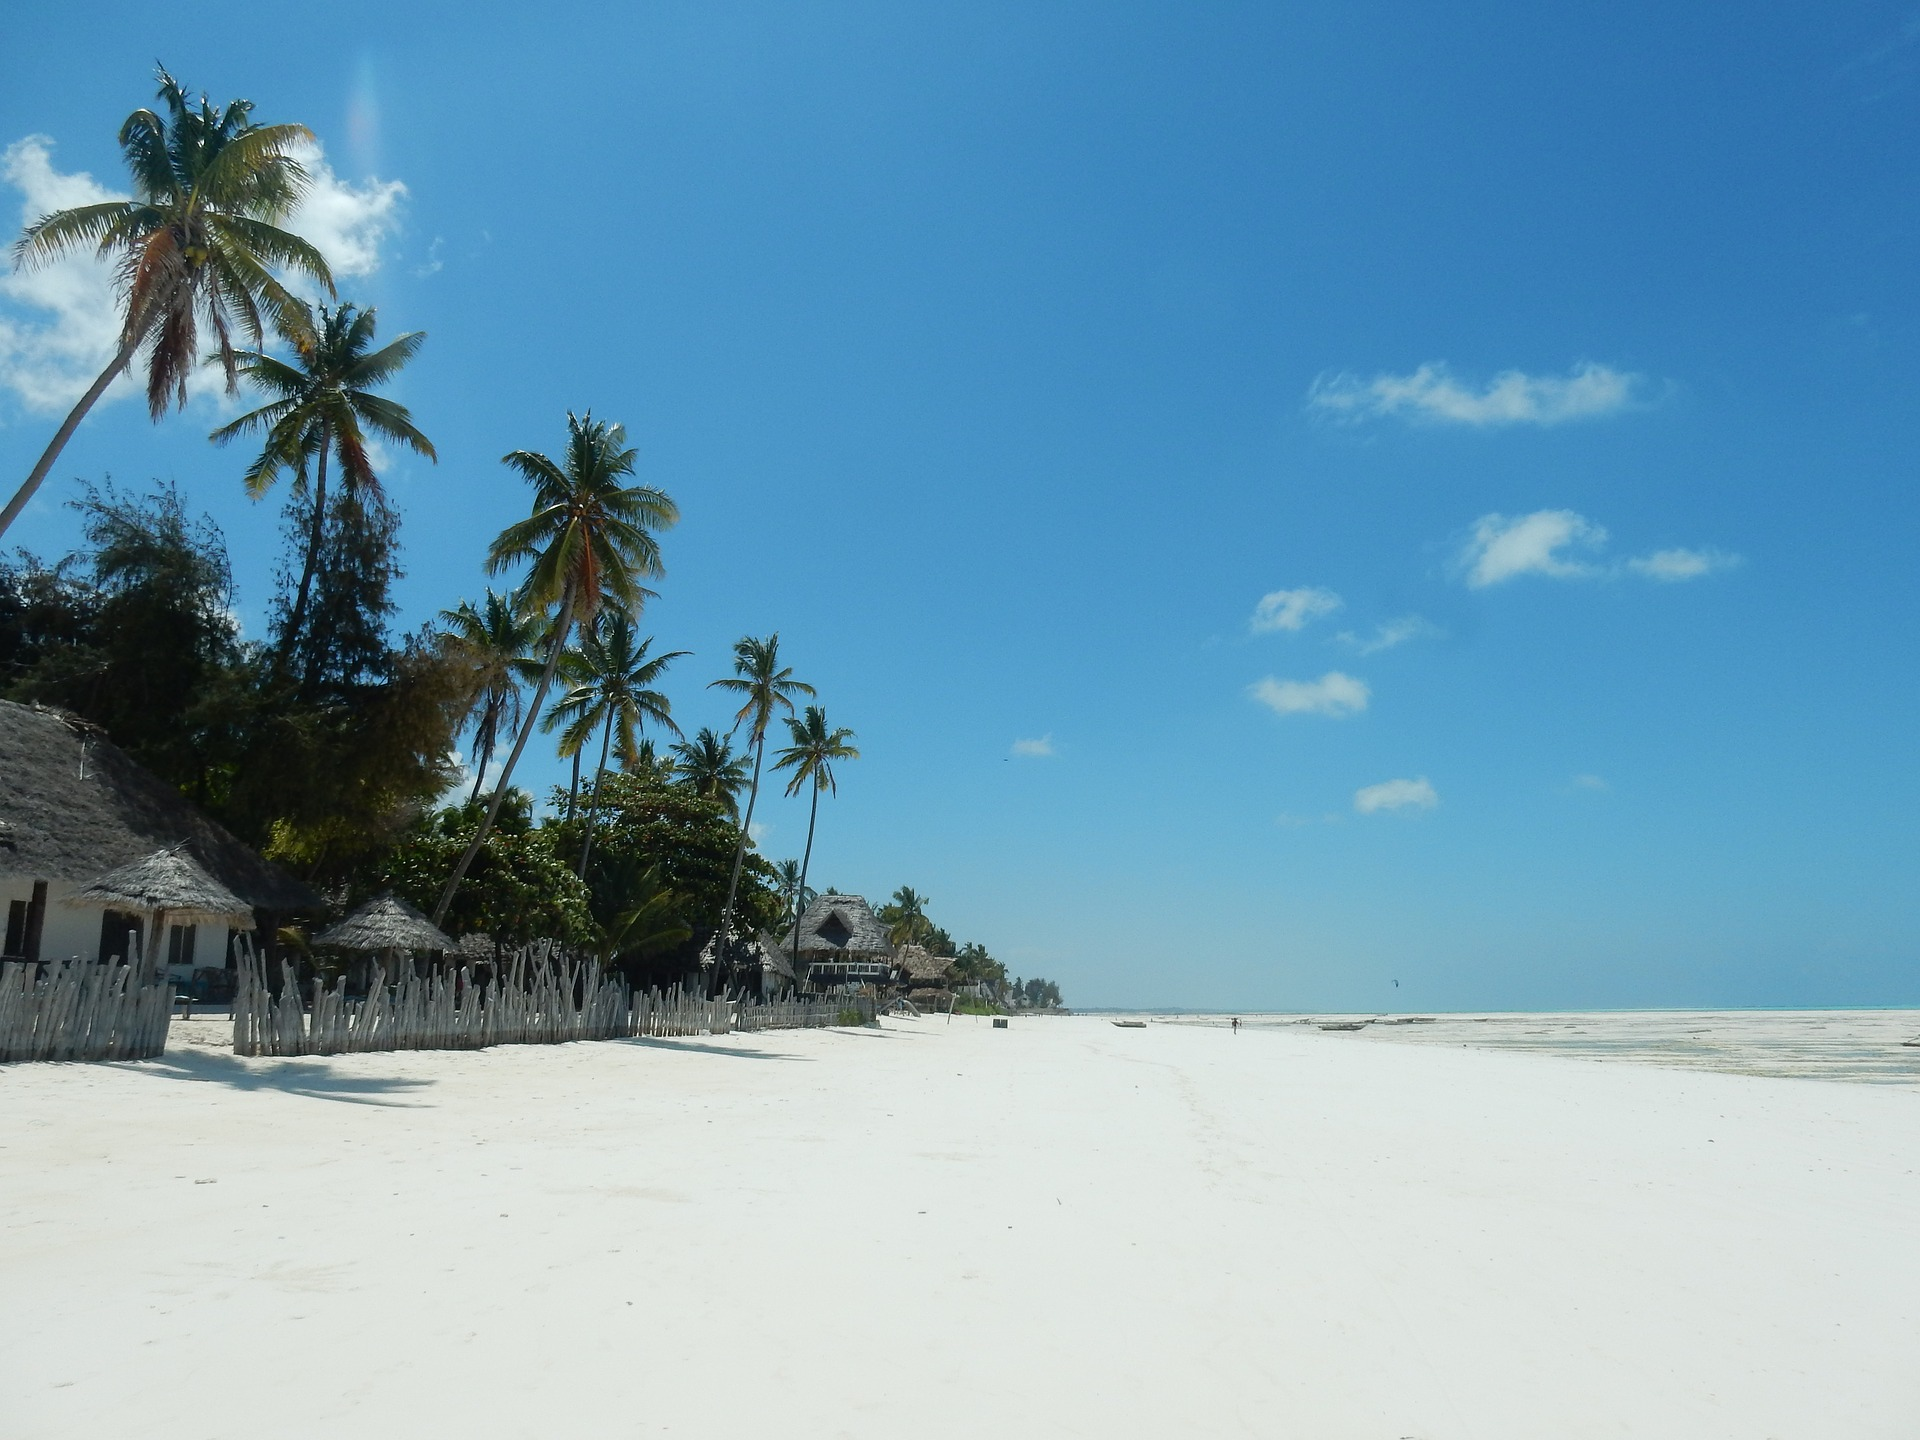 Classic Spize Island of Zanzibar Post Extension